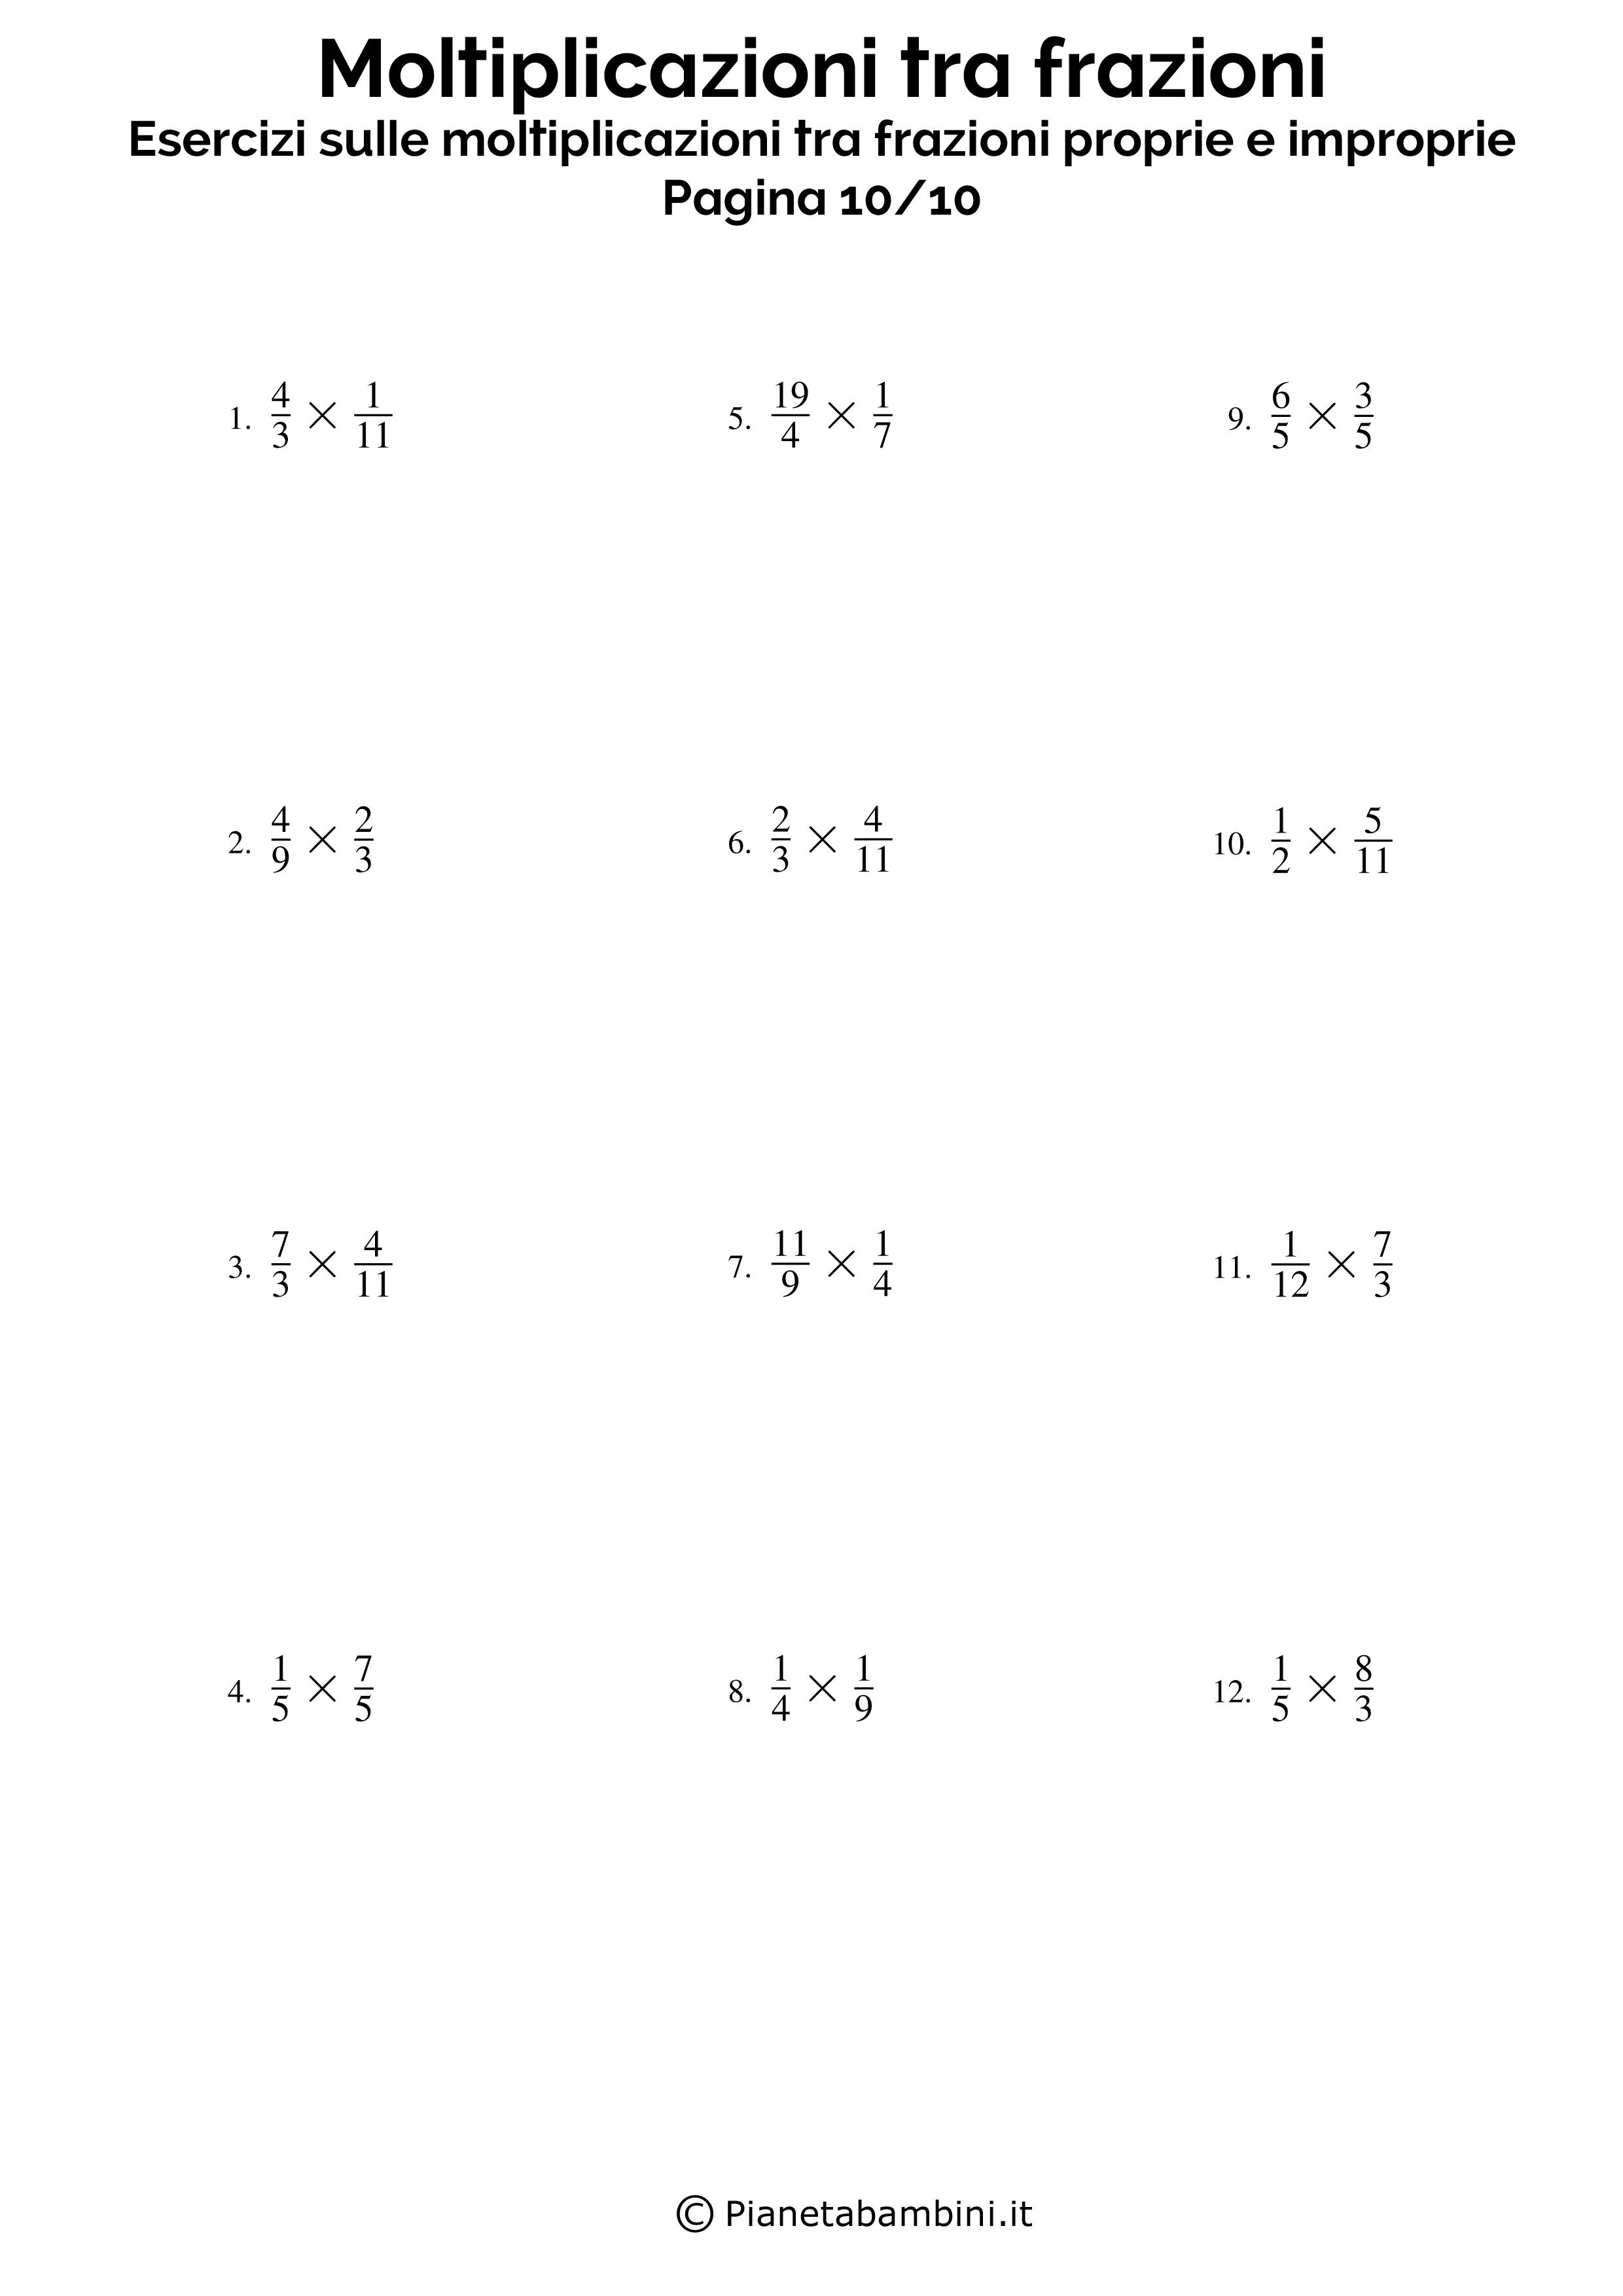 Moltiplicazioni-Frazioni-Proprie-Improprie_10